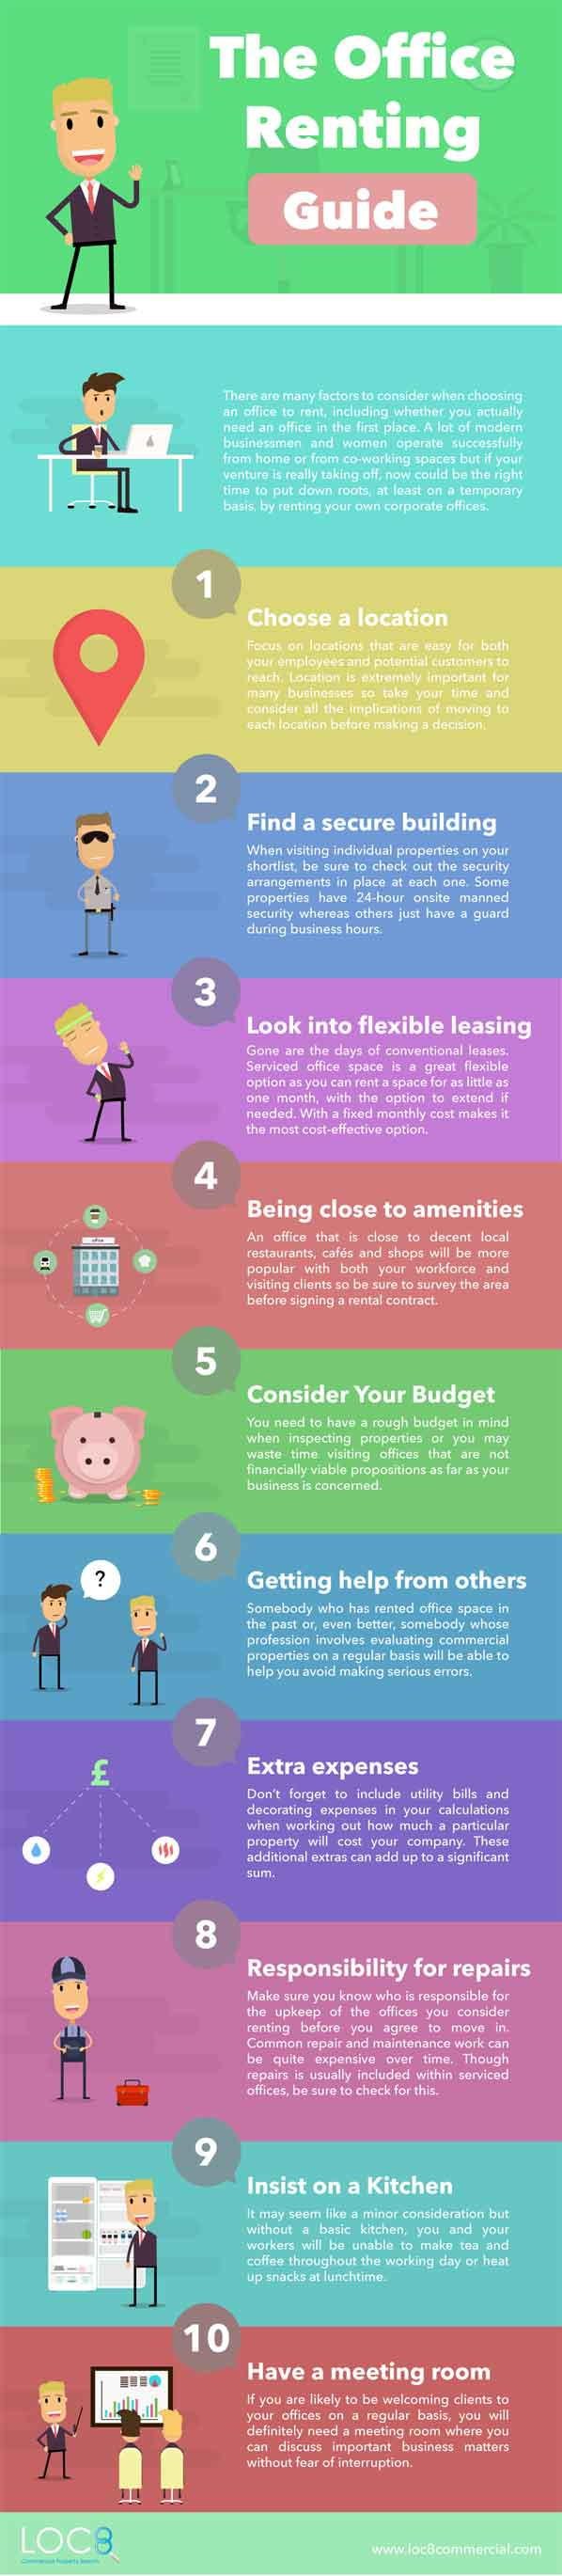 Office Rental Guide